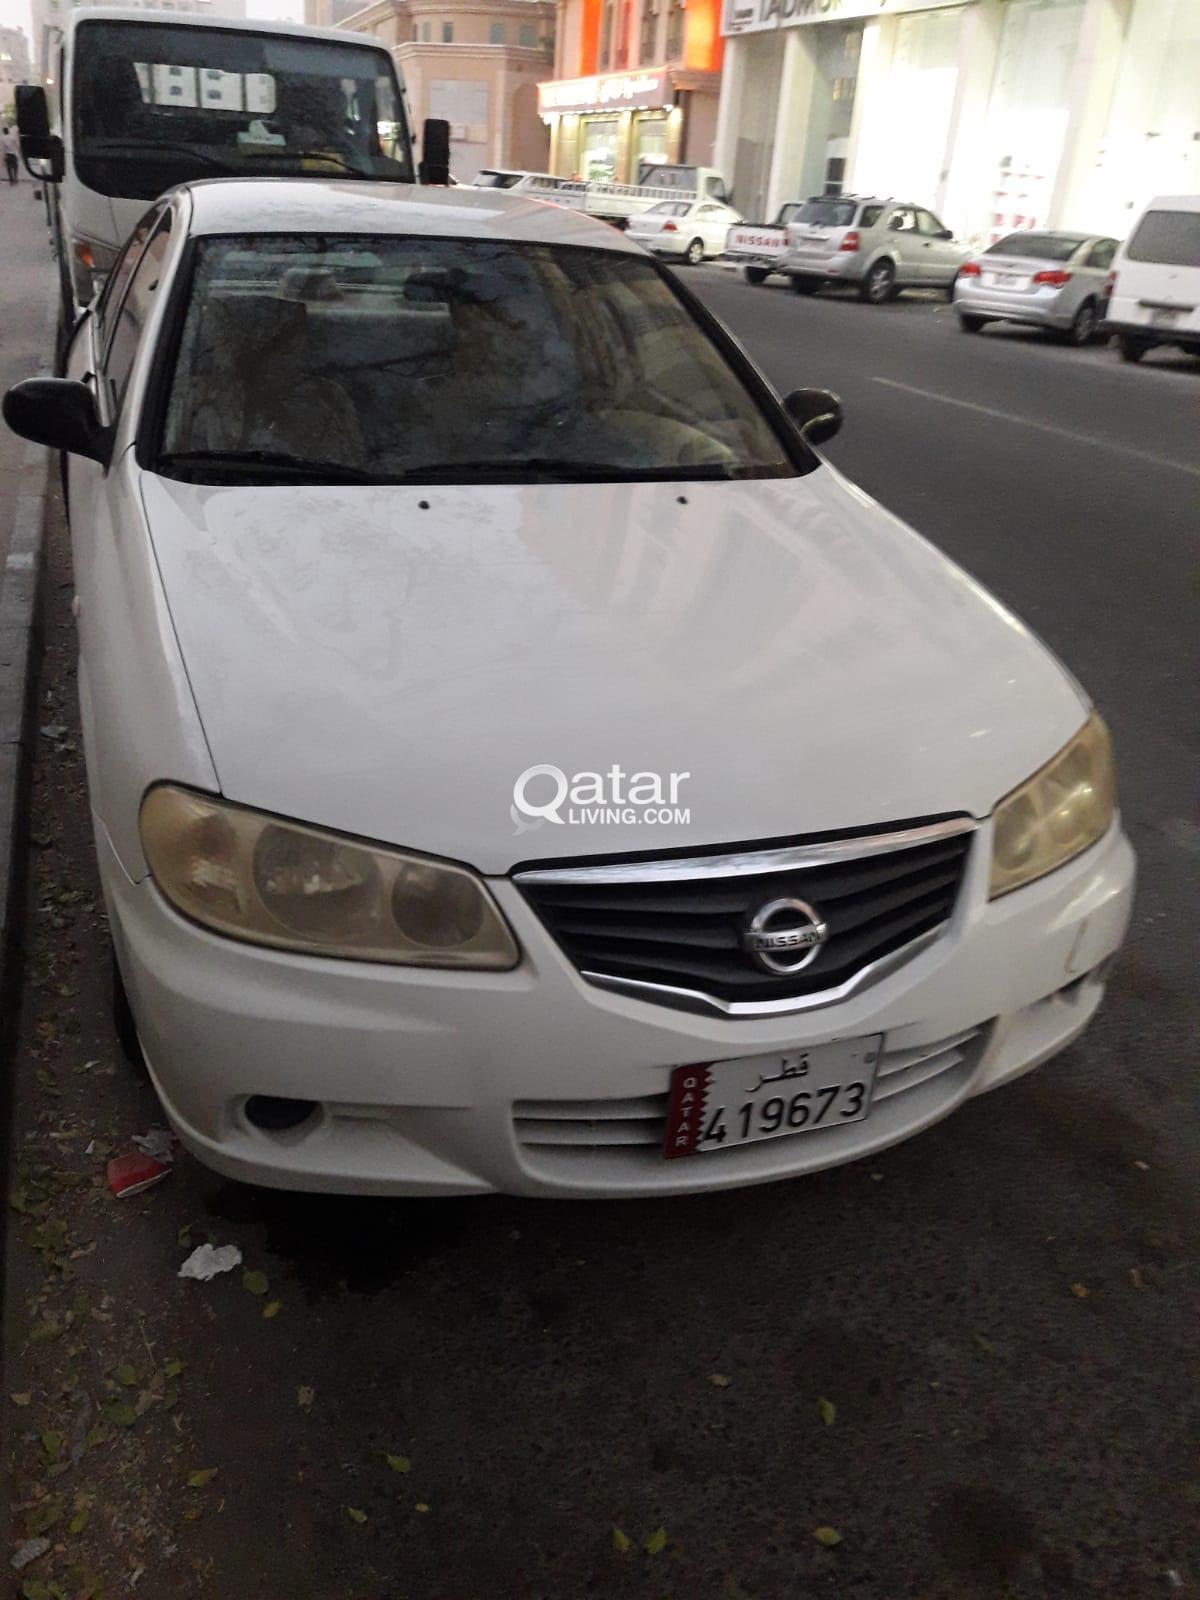 Nissan Sunny Japan 2010 For Sale Qatar Living